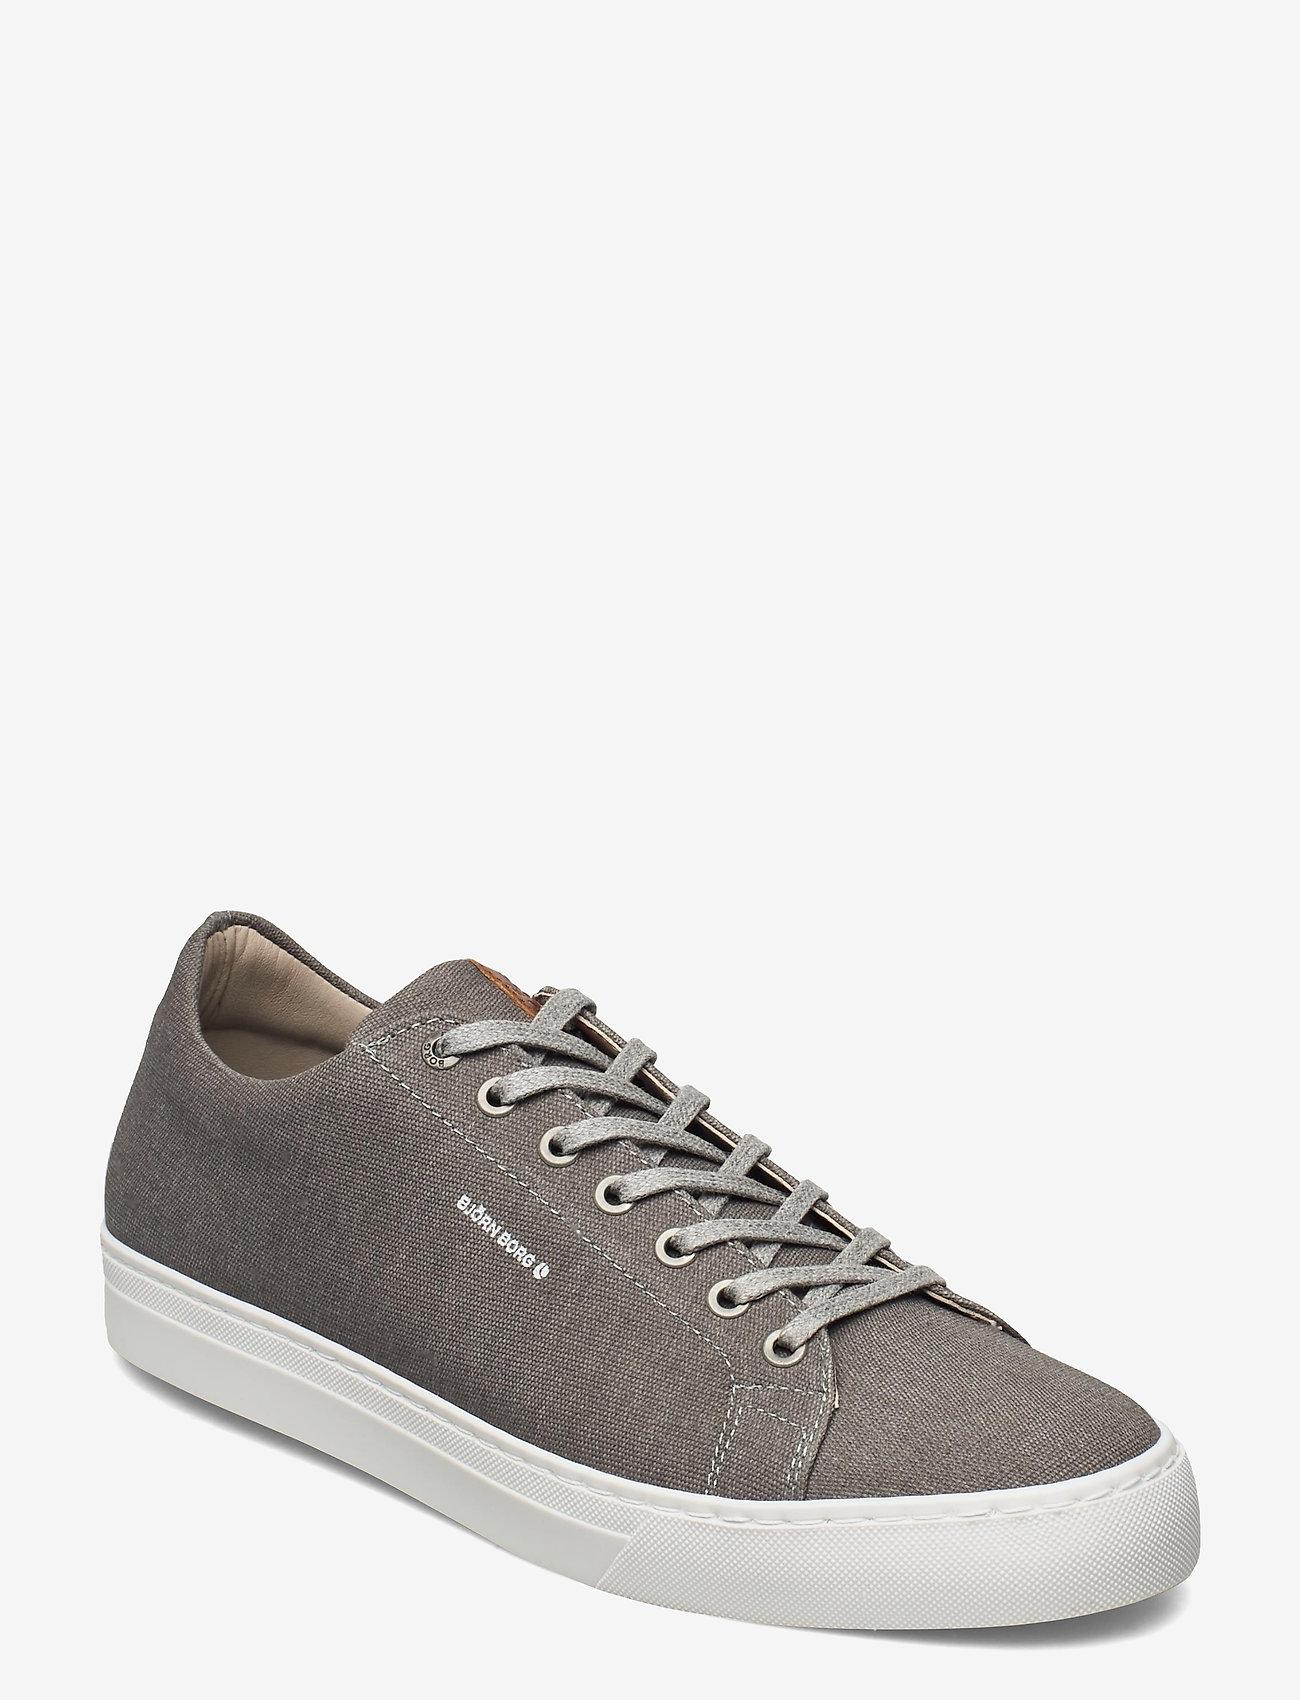 Björn Borg - JORDEN CVS M - laag sneakers - grey - 0